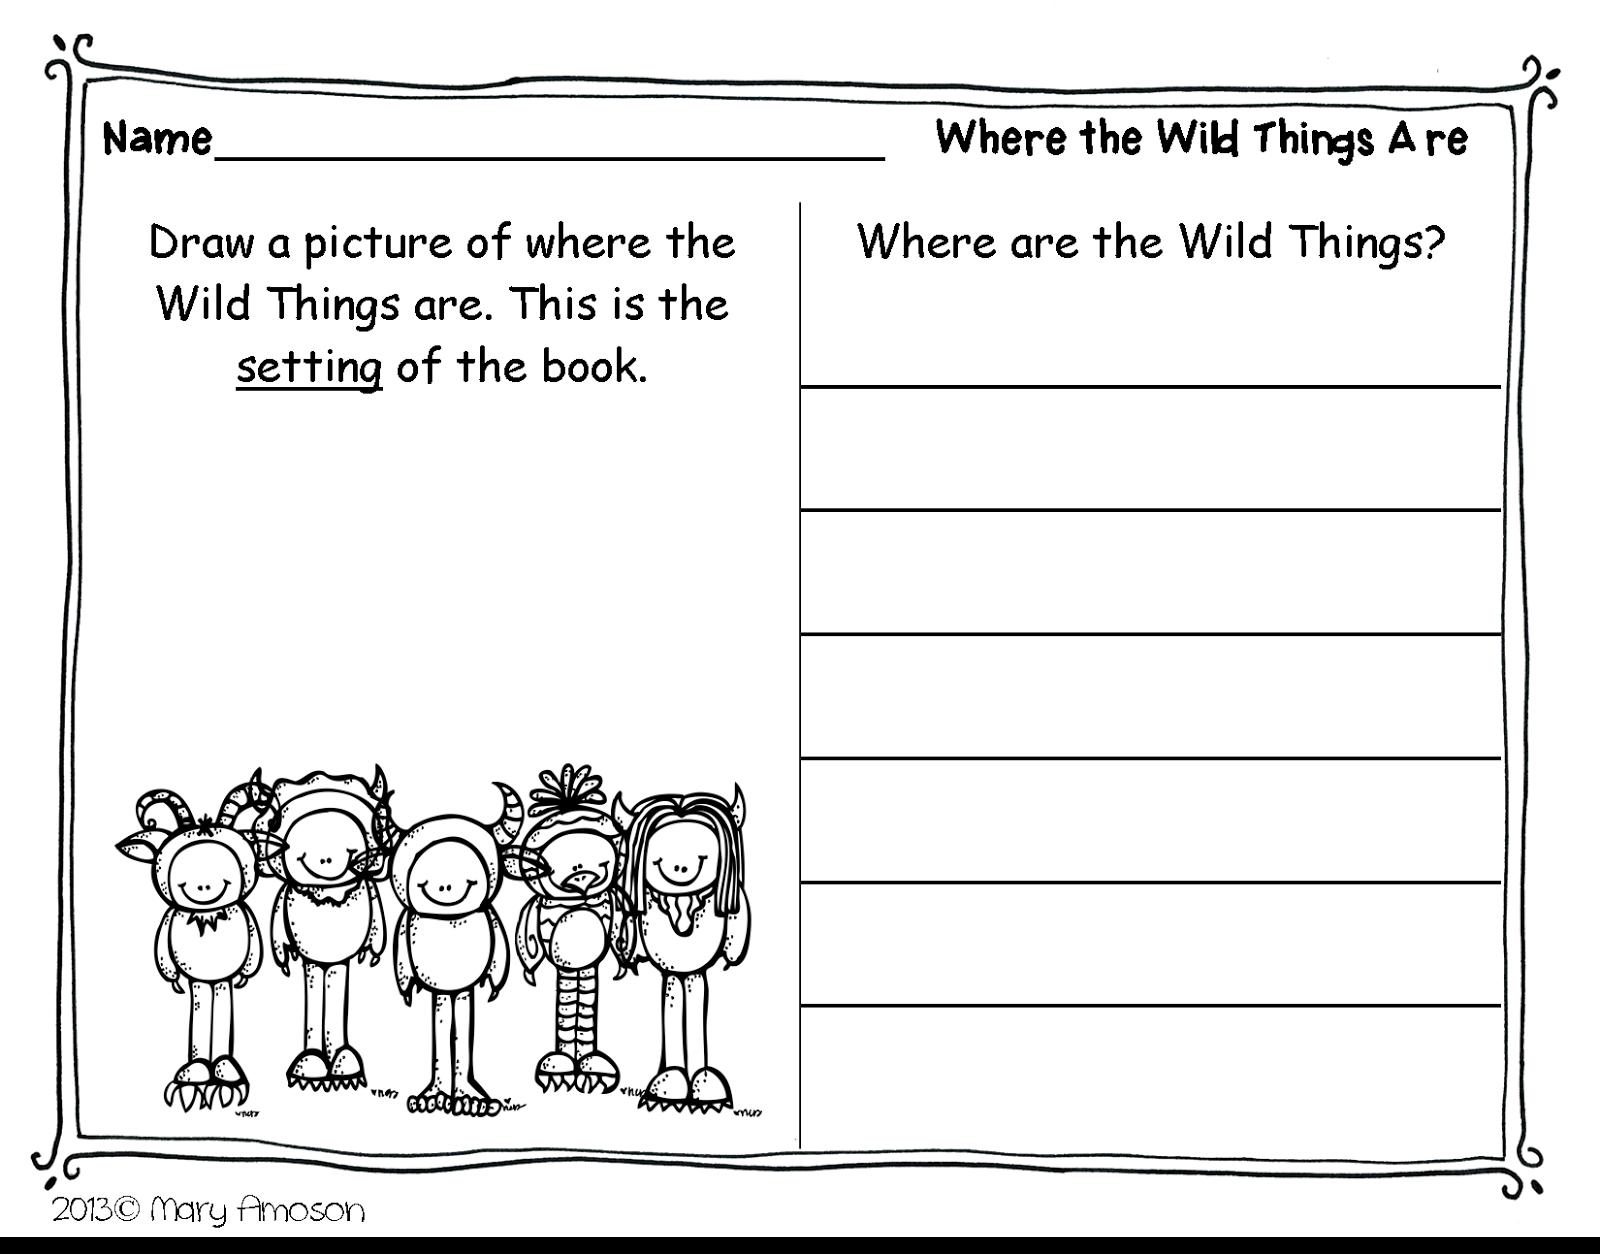 http://www.sharingkindergarten.com/2014/03/wild-about-ww.html